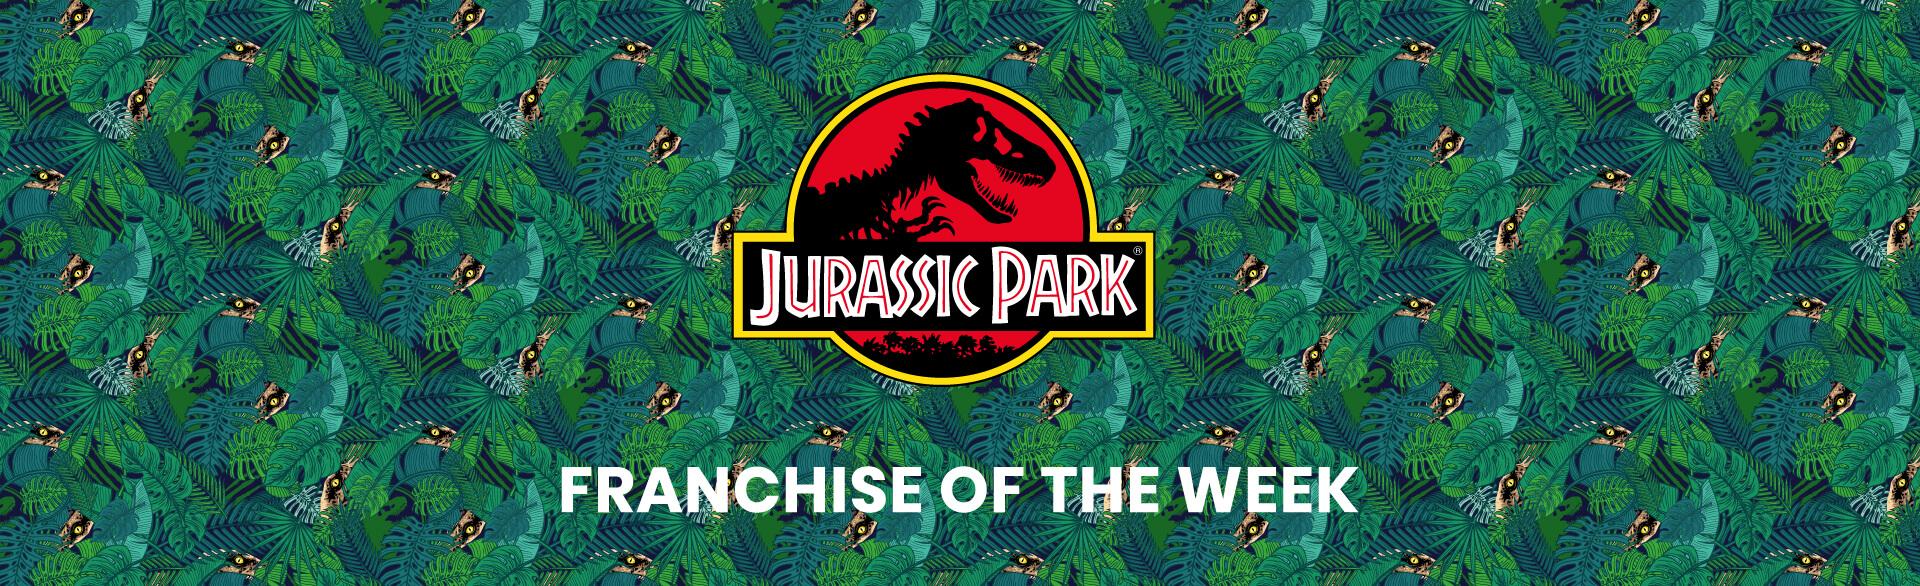 Jurassic Park Offers